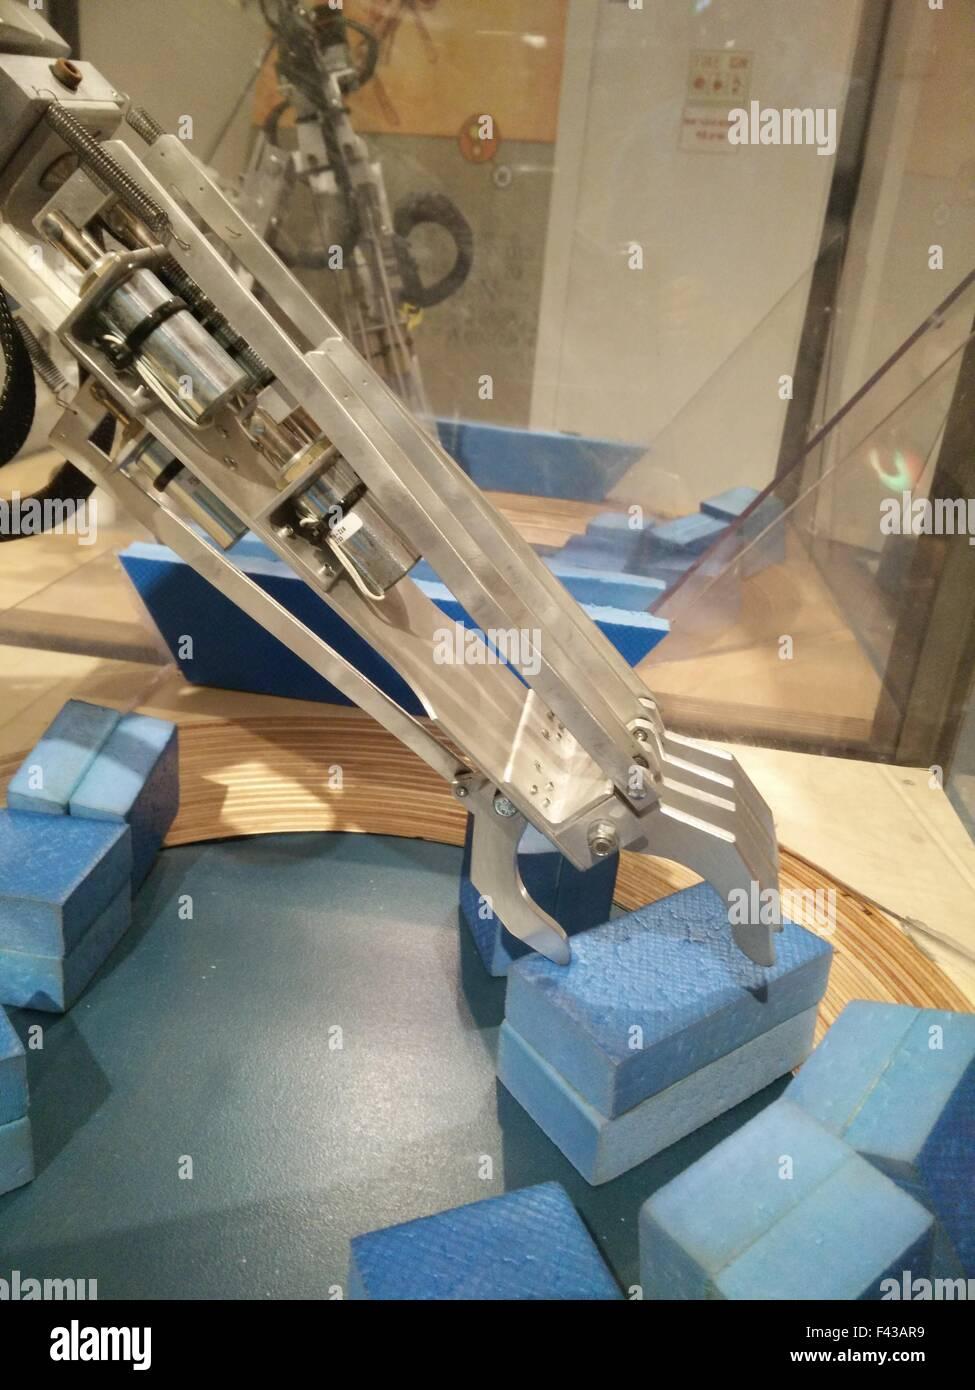 Robot Arm - Stock Image